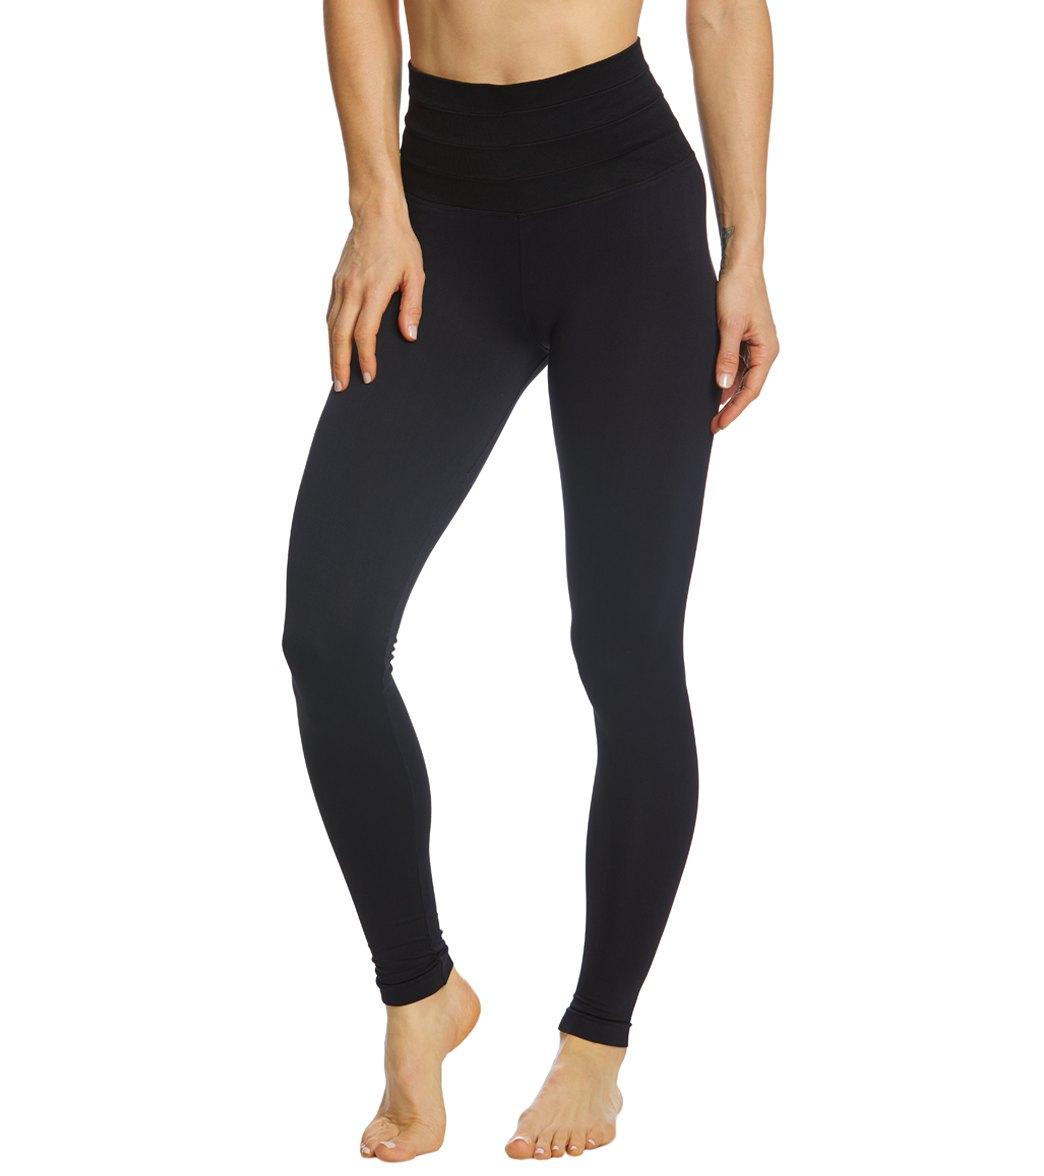 1fd0caab00221 NUX CJ High Waist Seamless Yoga Leggings at YogaOutlet.com - Free ...